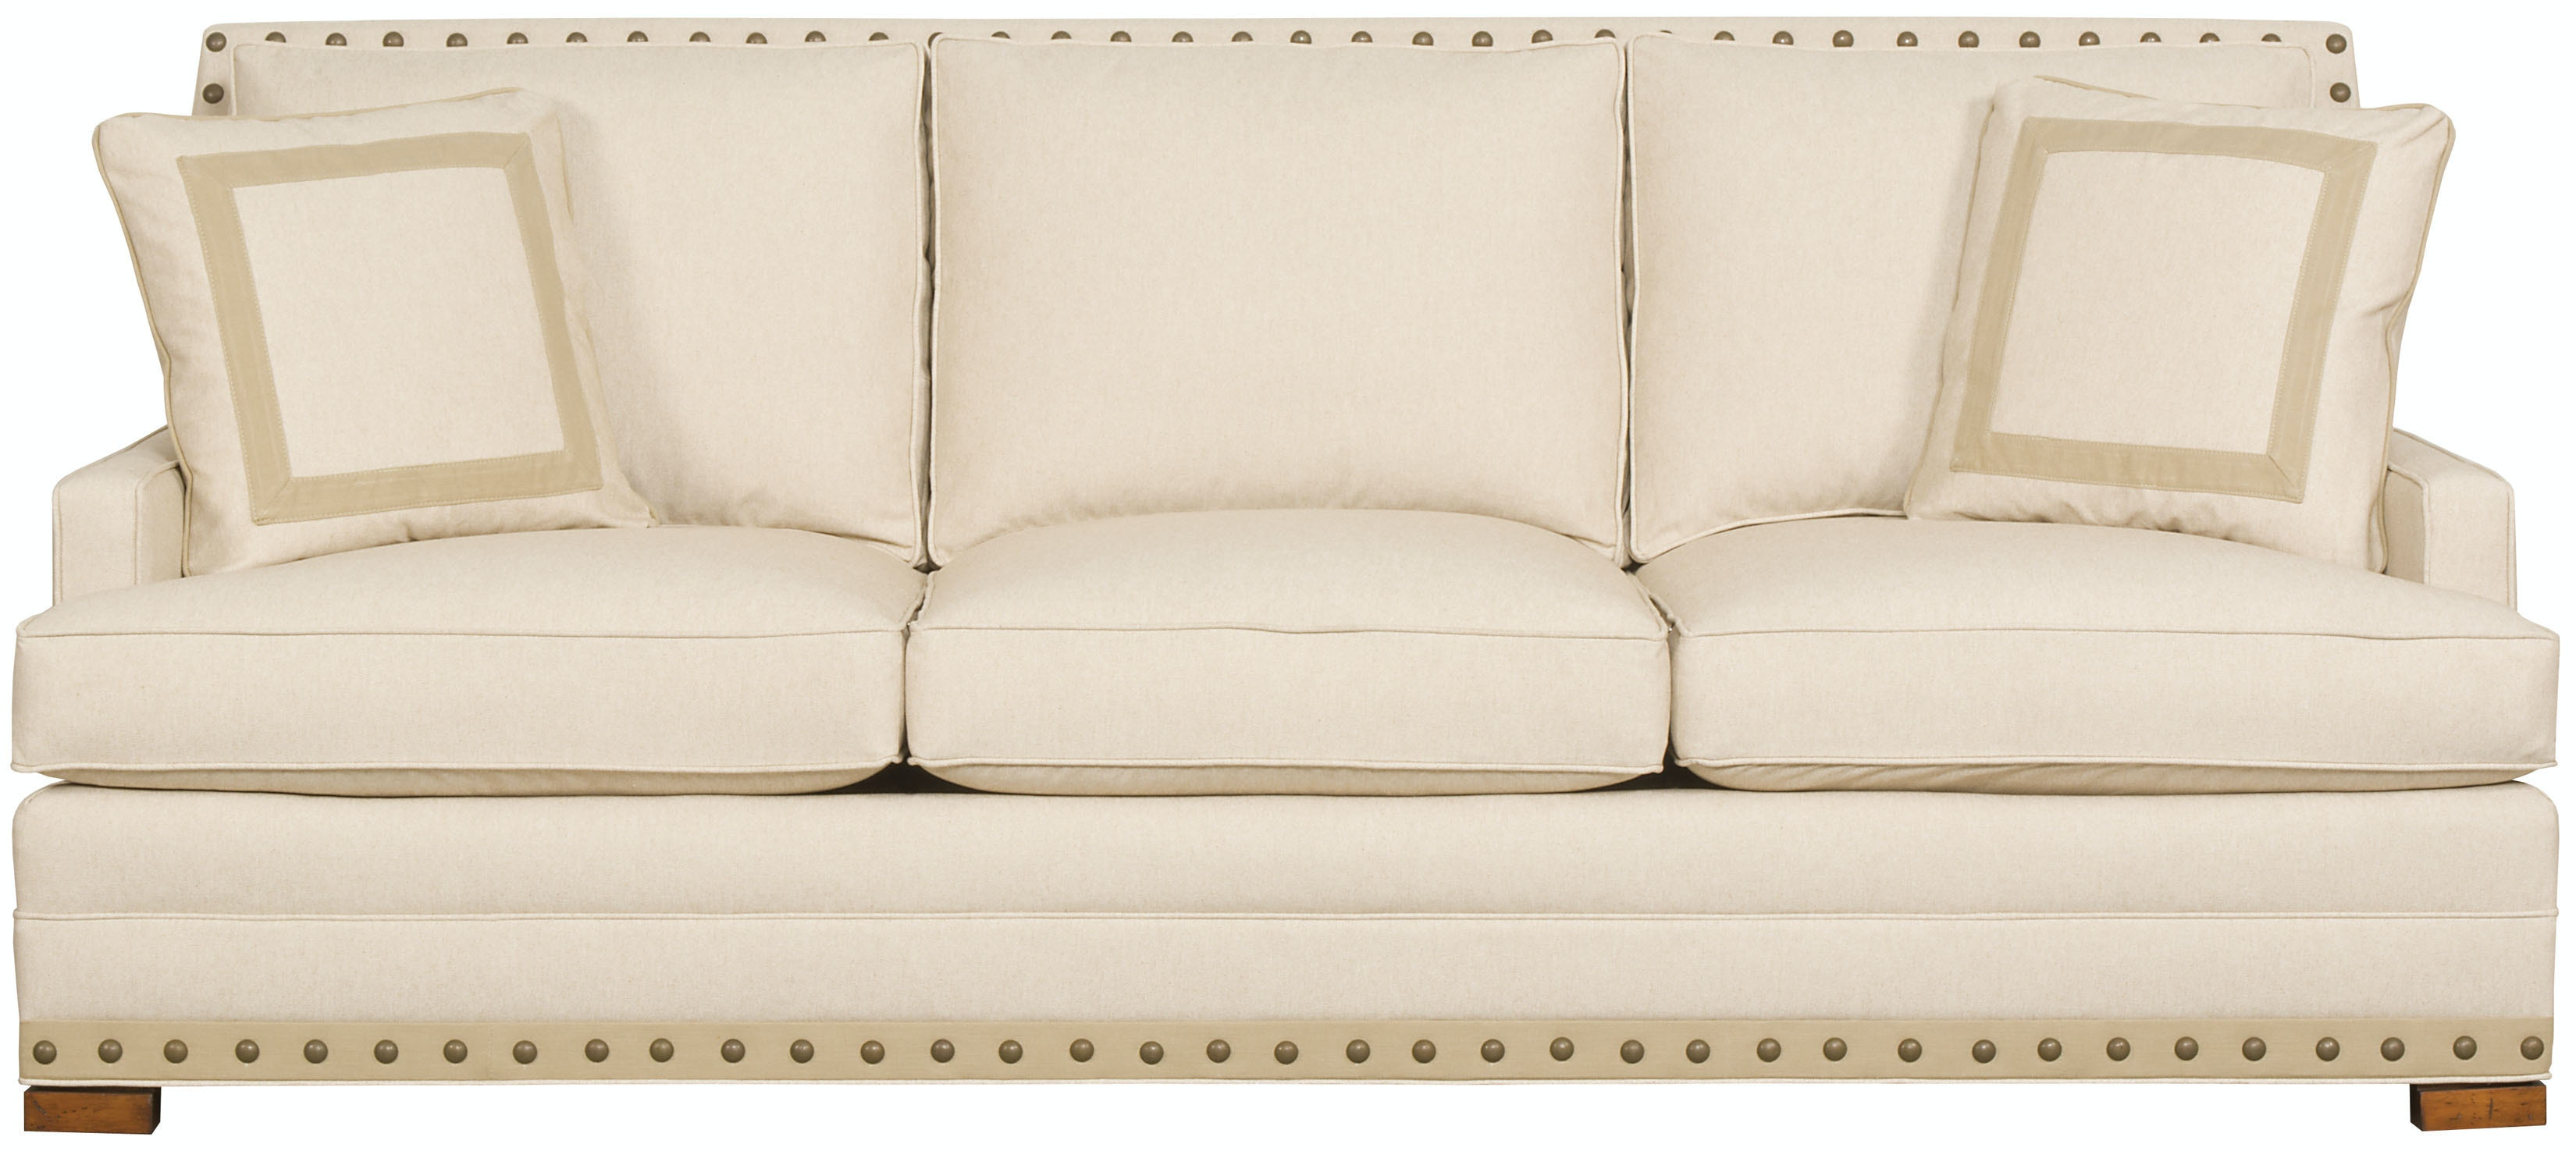 Exceptionnel Vanguard Living Room Riverside Sofa 604 S   Birmingham Wholesale Furniture    Birmingham, AL